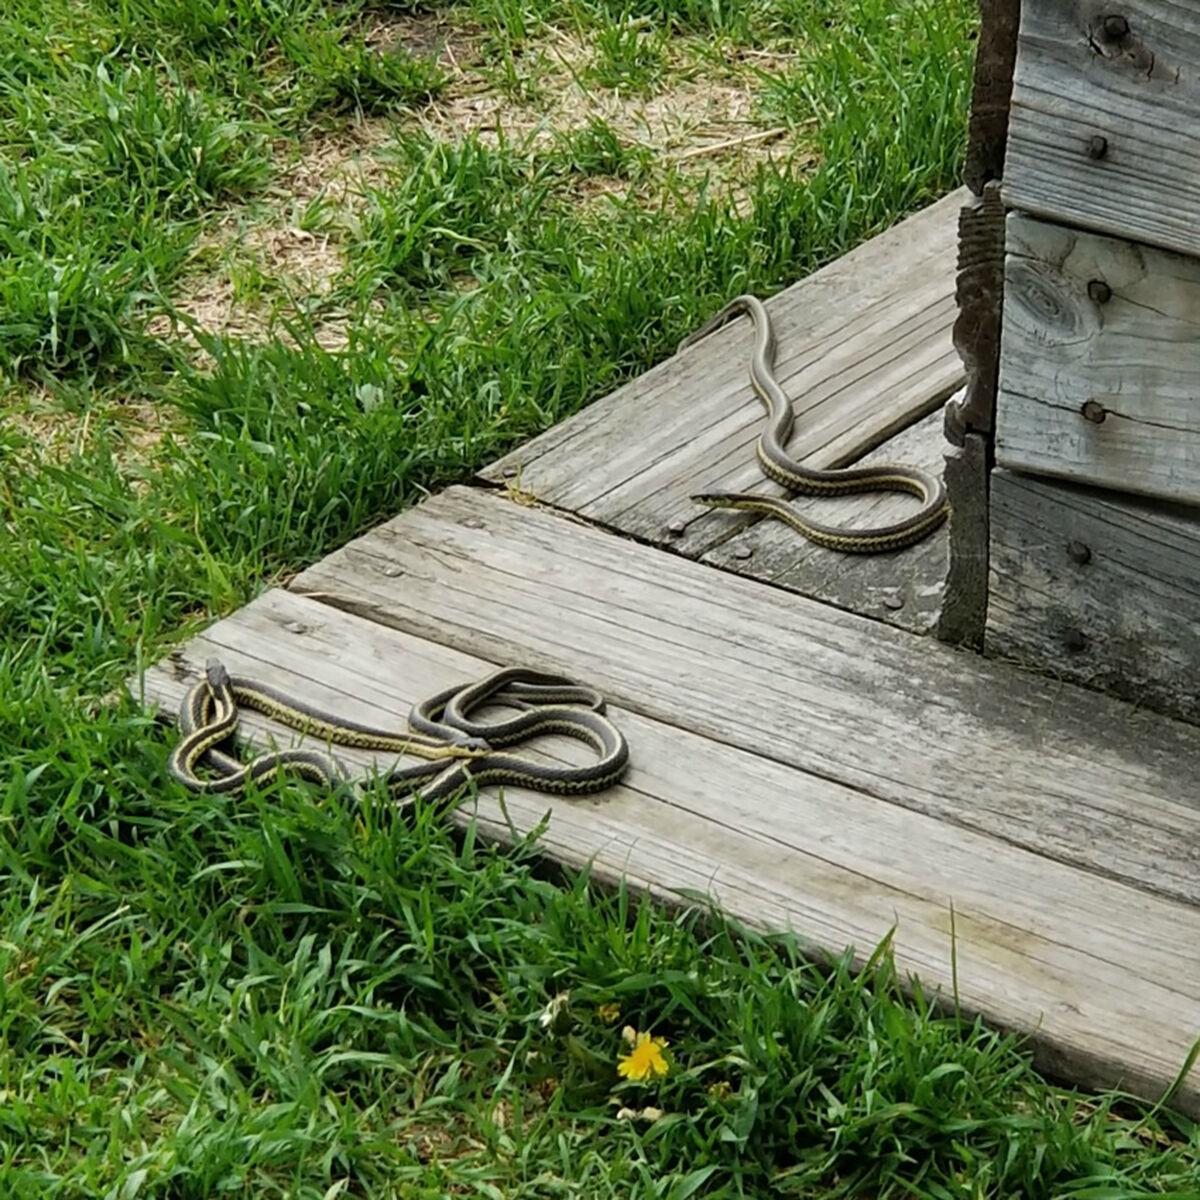 Baby Eastern Ribbon Snake friends